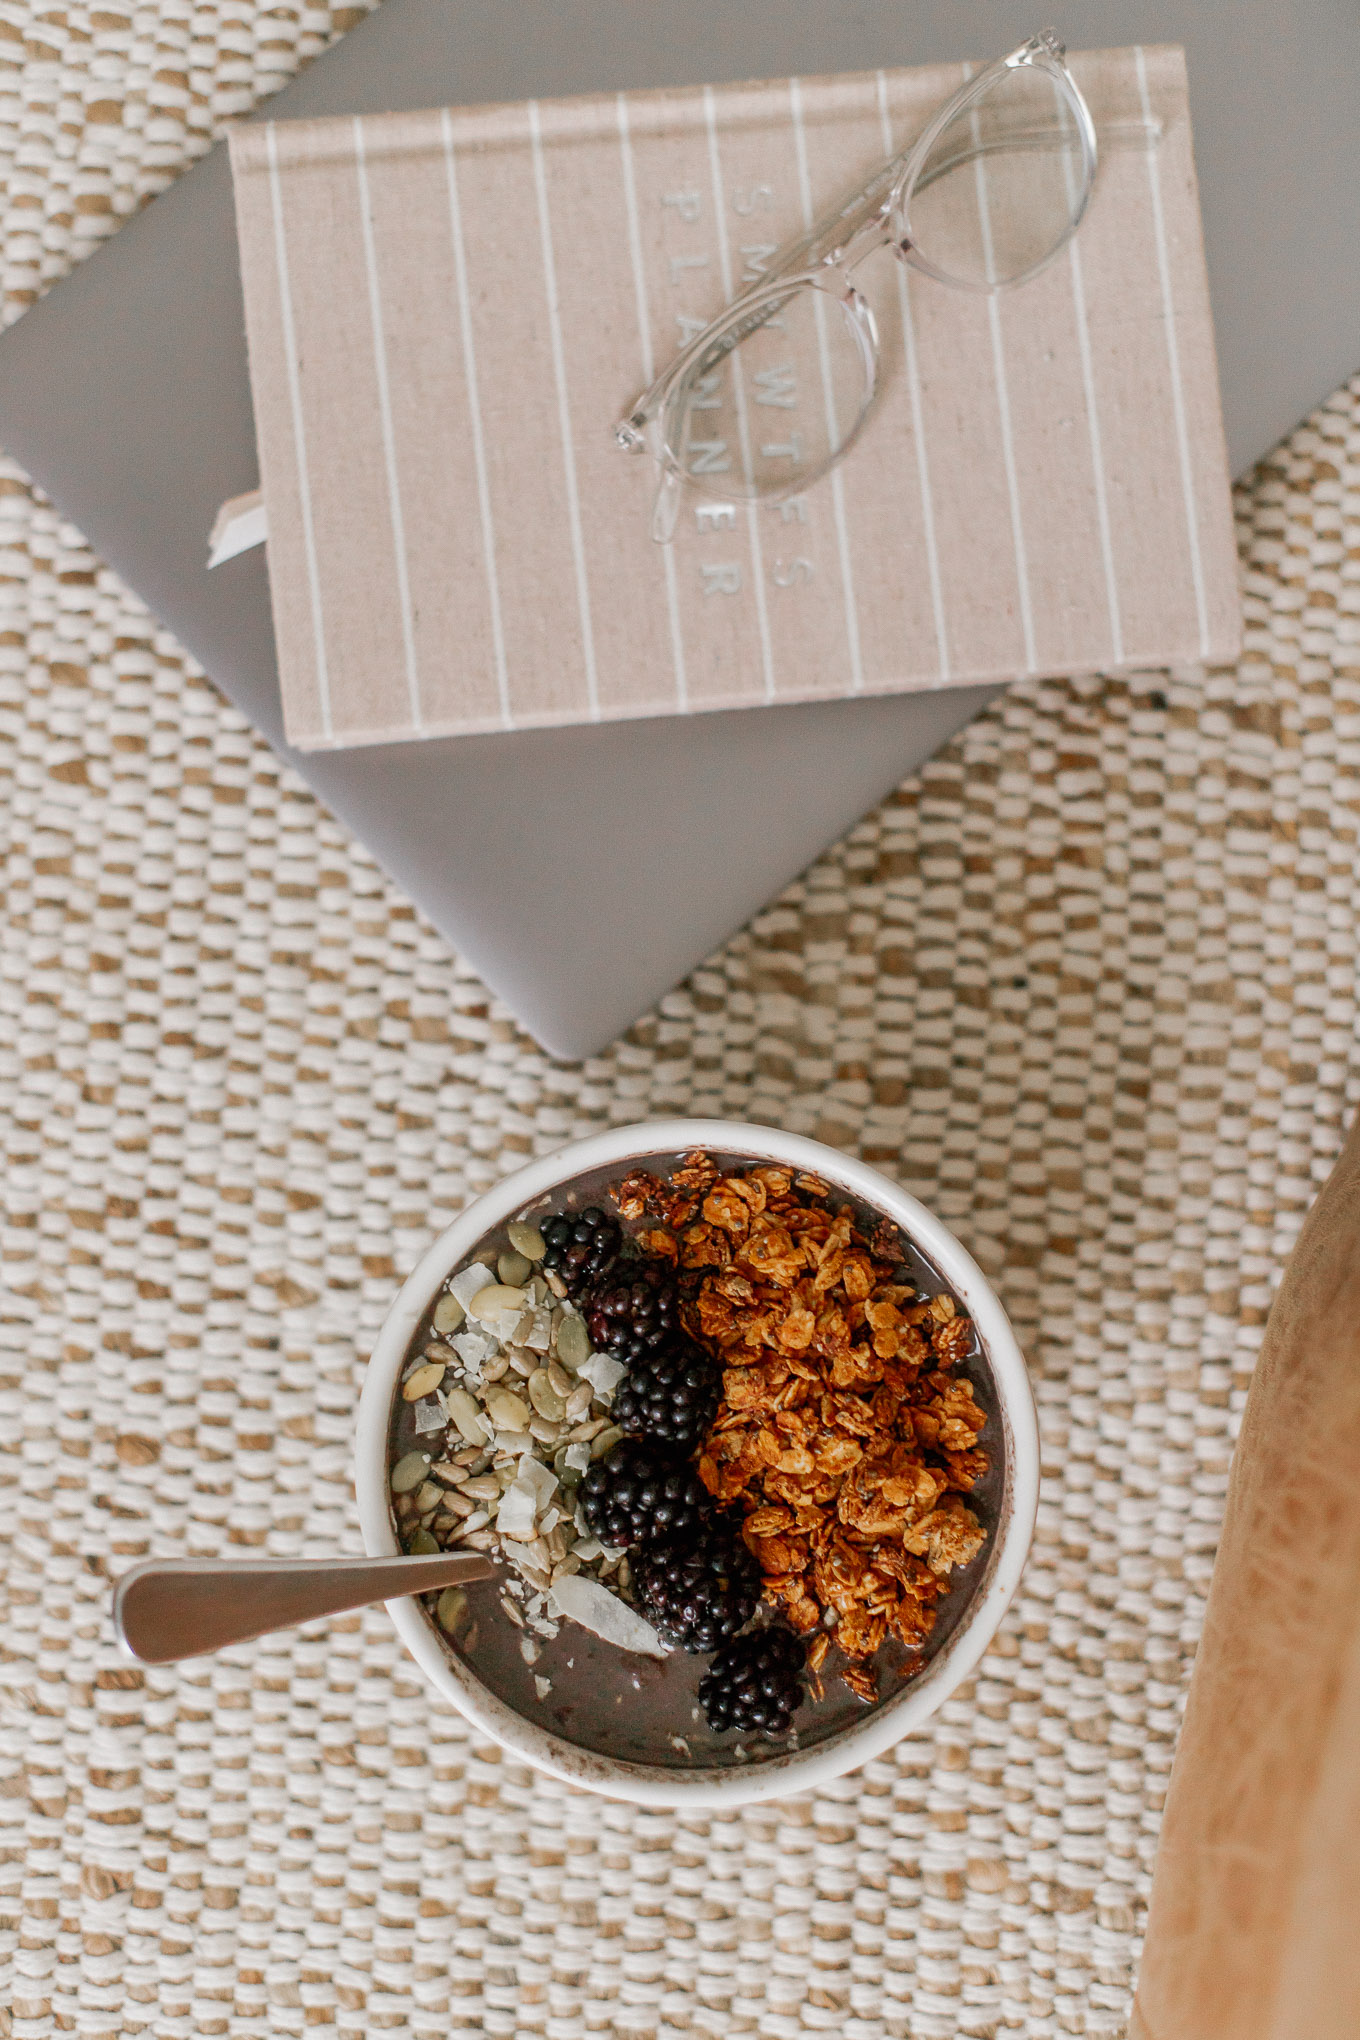 Easy Acai Bowl Recipe to Make at Home | Louella Reese